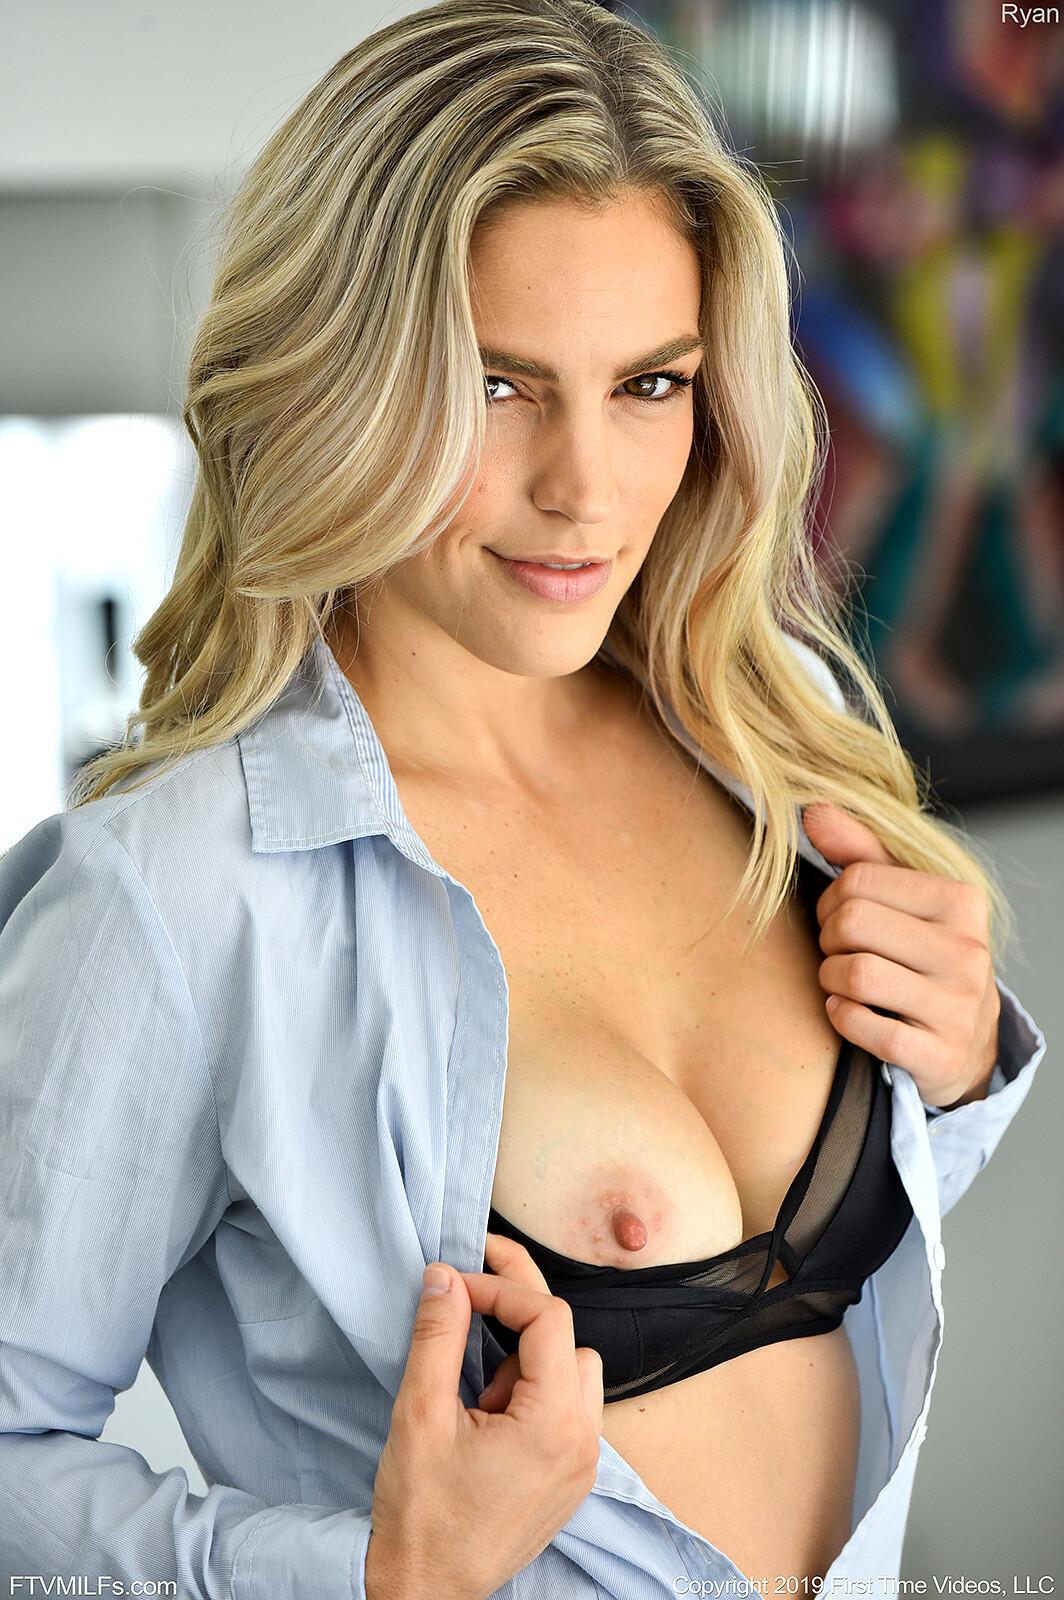 Actrices Porno Big Boobs babe today ftv milfs ryan ryans actrices big tits actualporn